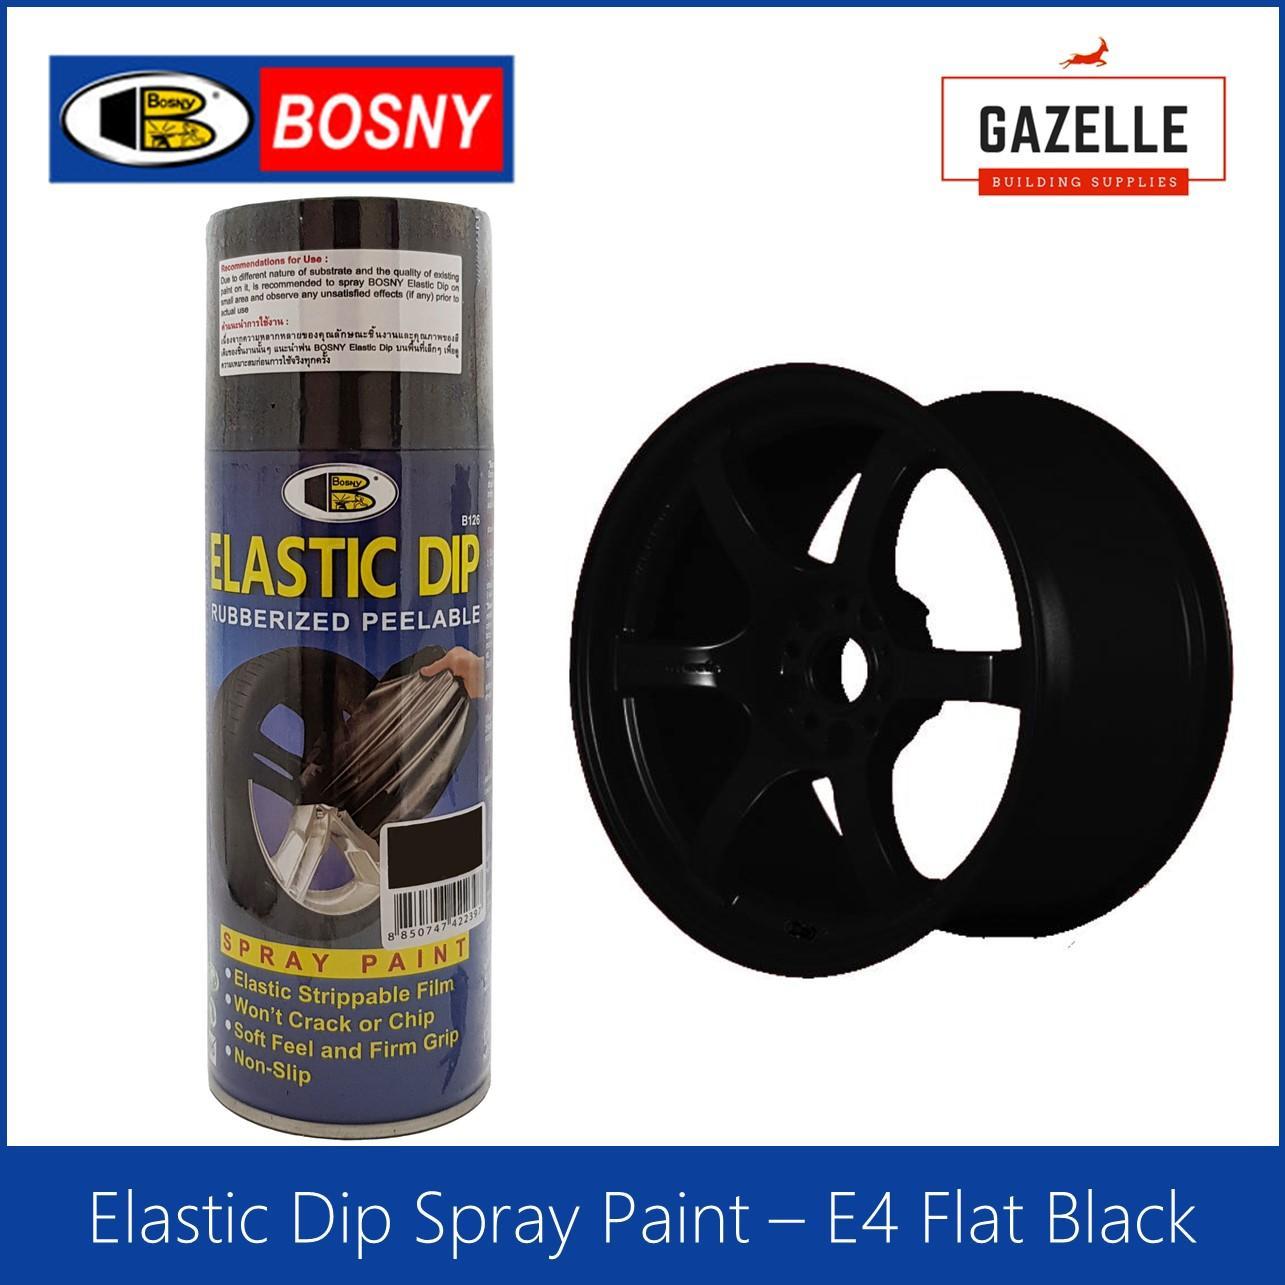 Bosny Elastic Dip Rubber Coating Peelable - E4 Flat Black